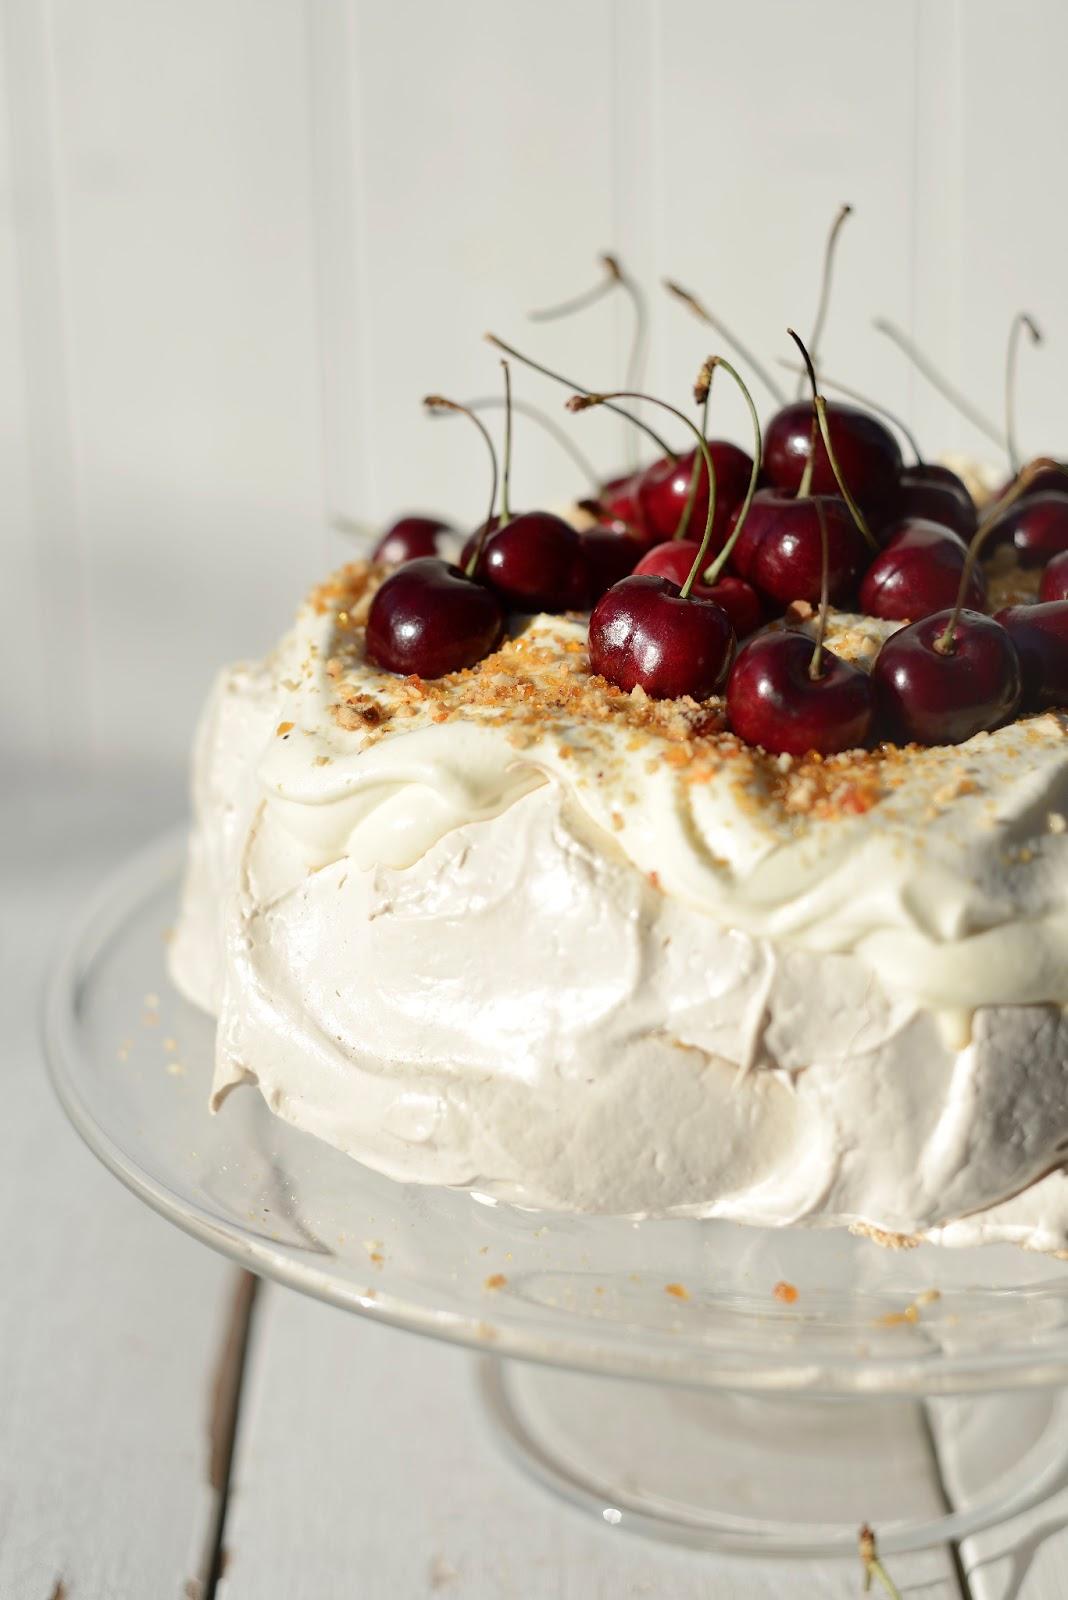 From The Kitchen: Brown Sugar Pavlova